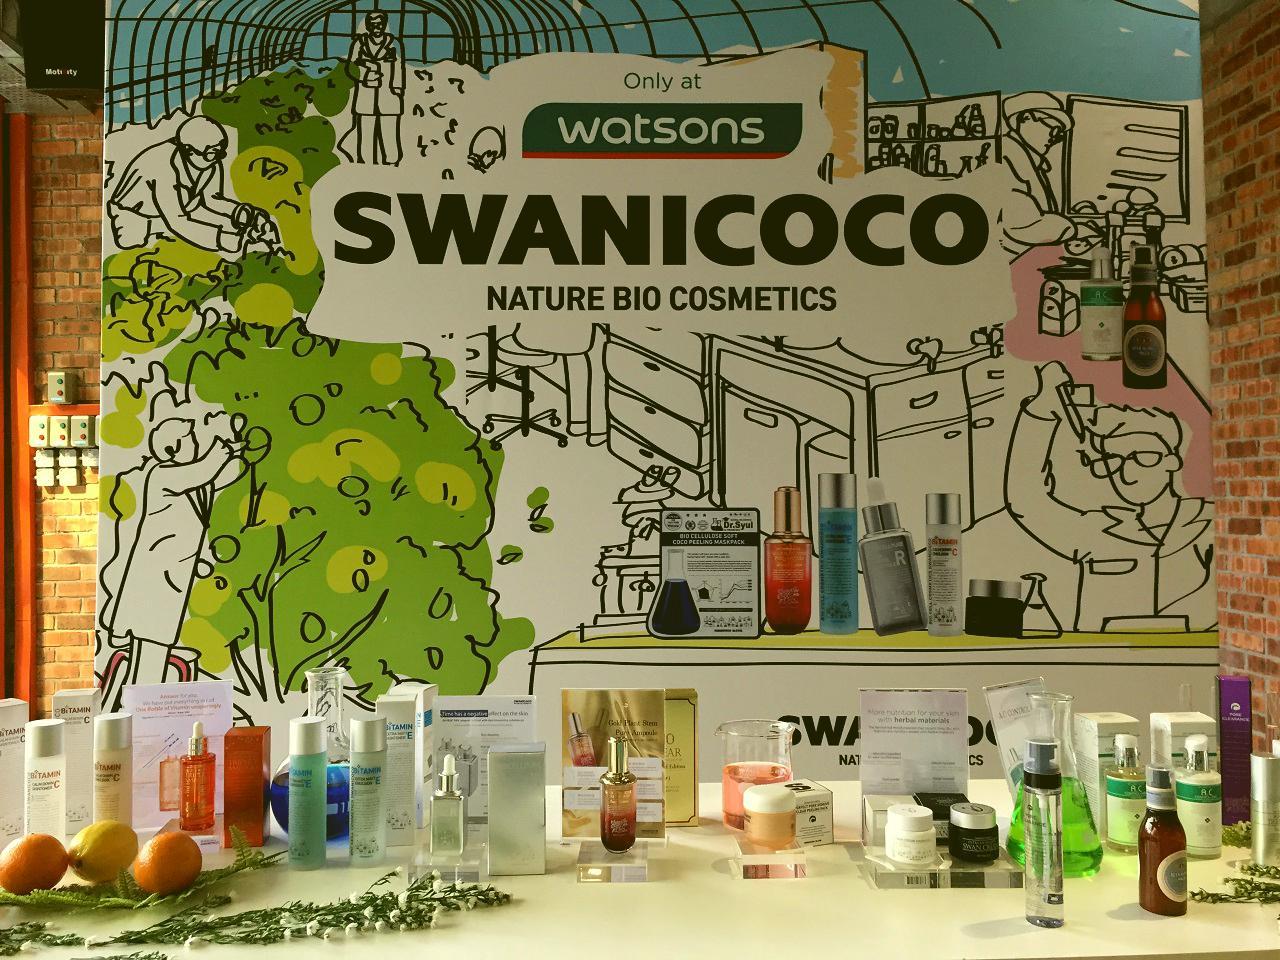 #Scenes: South Korea's Top Bio Cosmetics Brand, Swanicoco ...